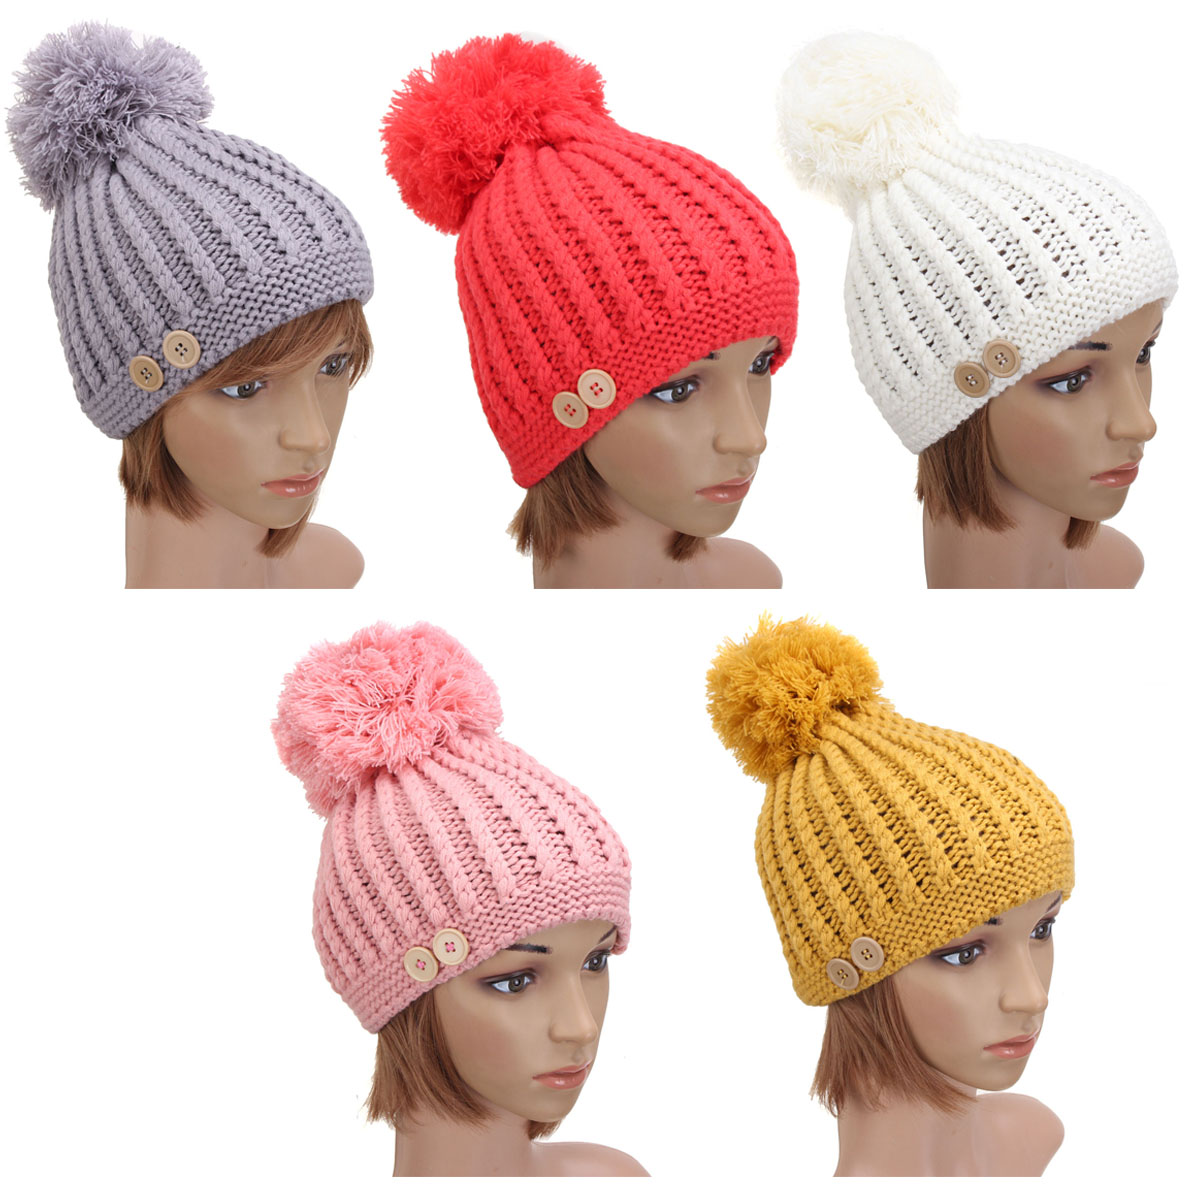 c8567c9f94f ... Women Ladies Button Crochet Knitted Beret Hat Ski Beanie Ball Wool  Winter Warm Cap - Thumbnail